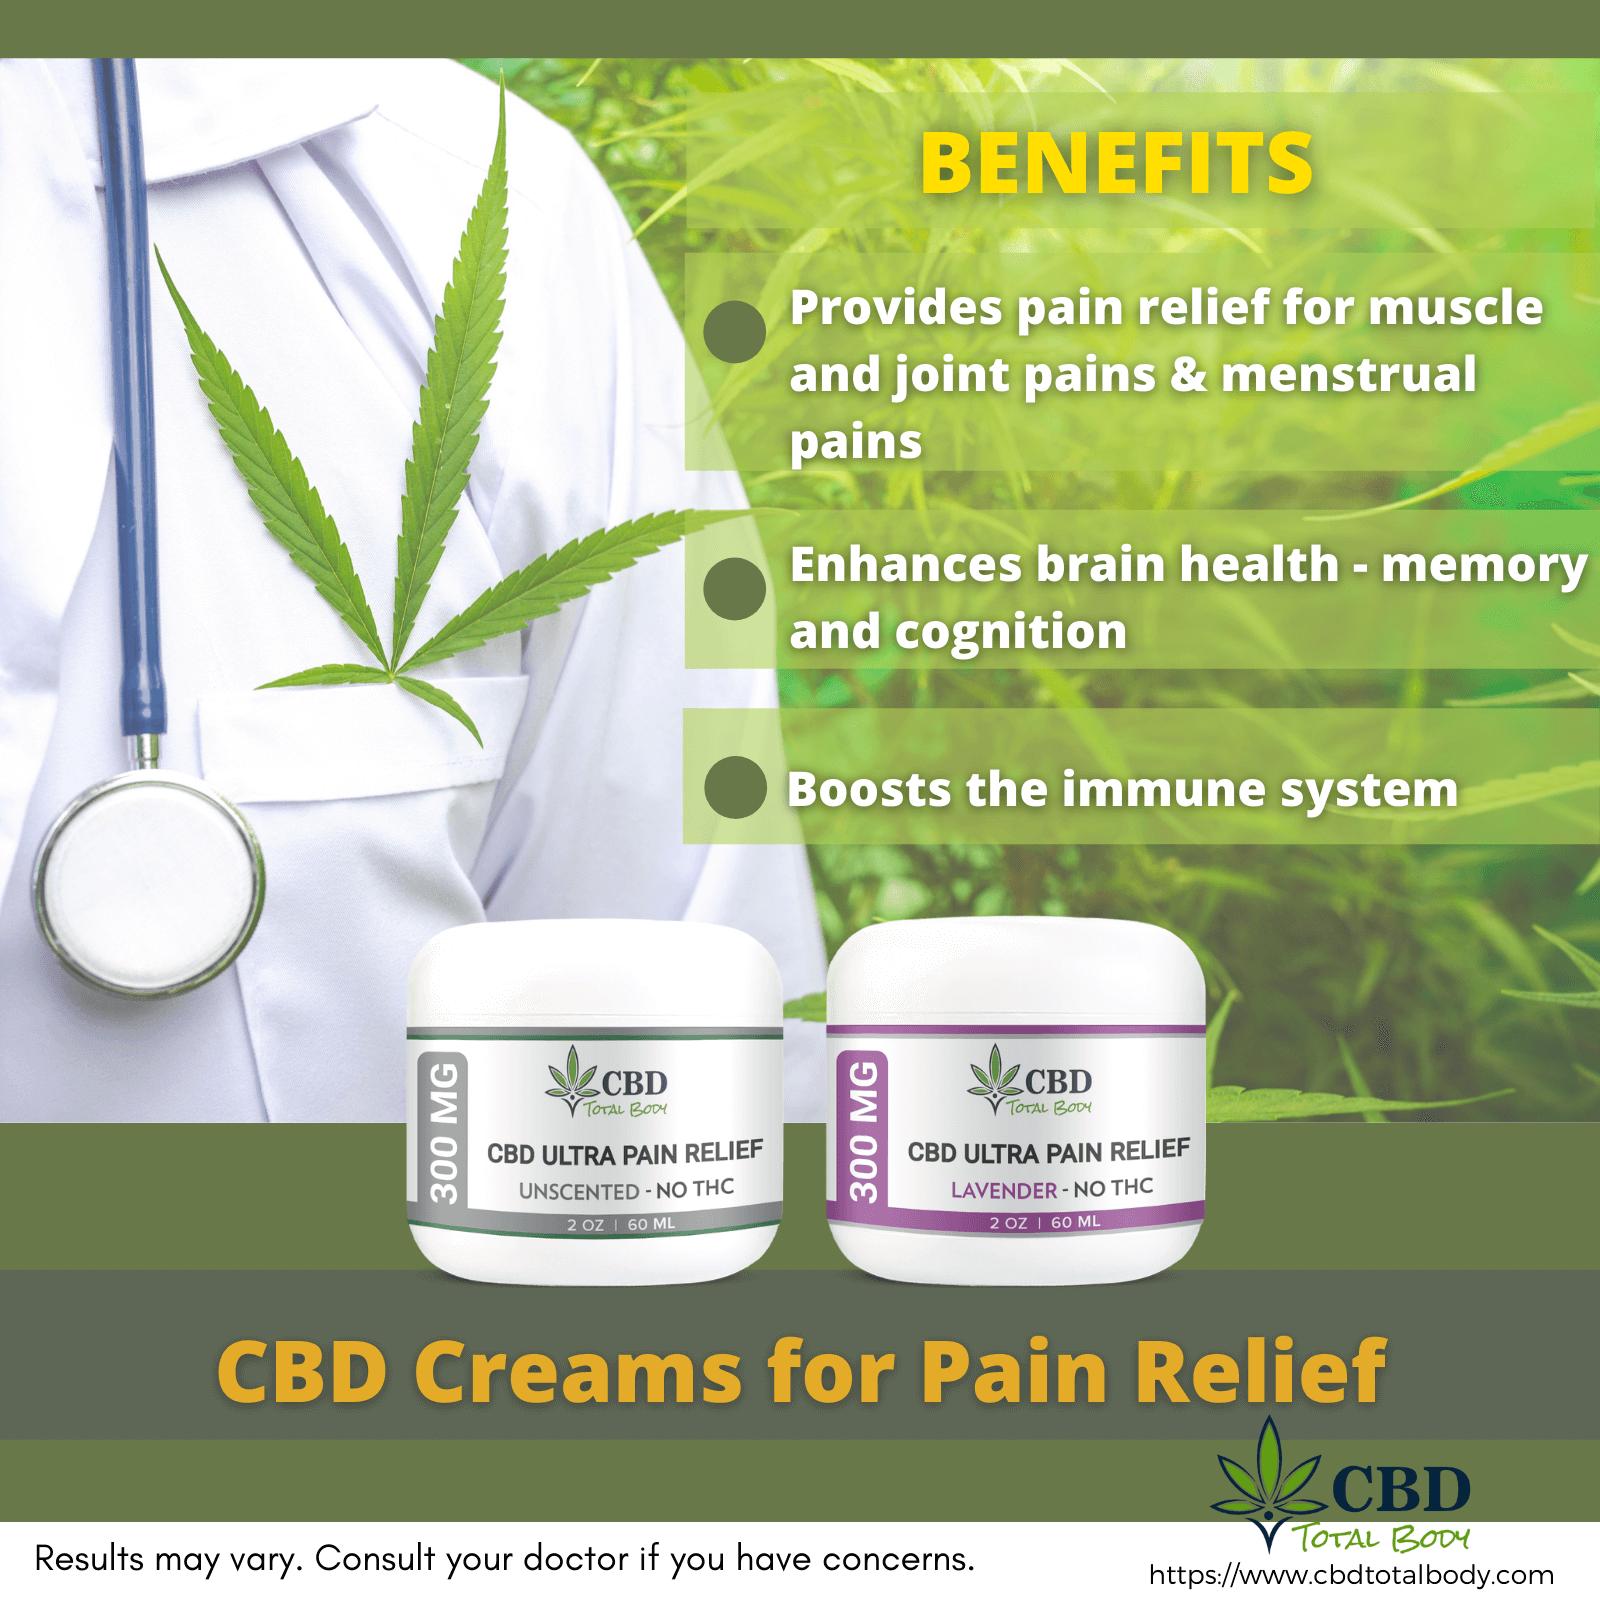 CBD Creams 2oz Jar for Pain Relief Infographic